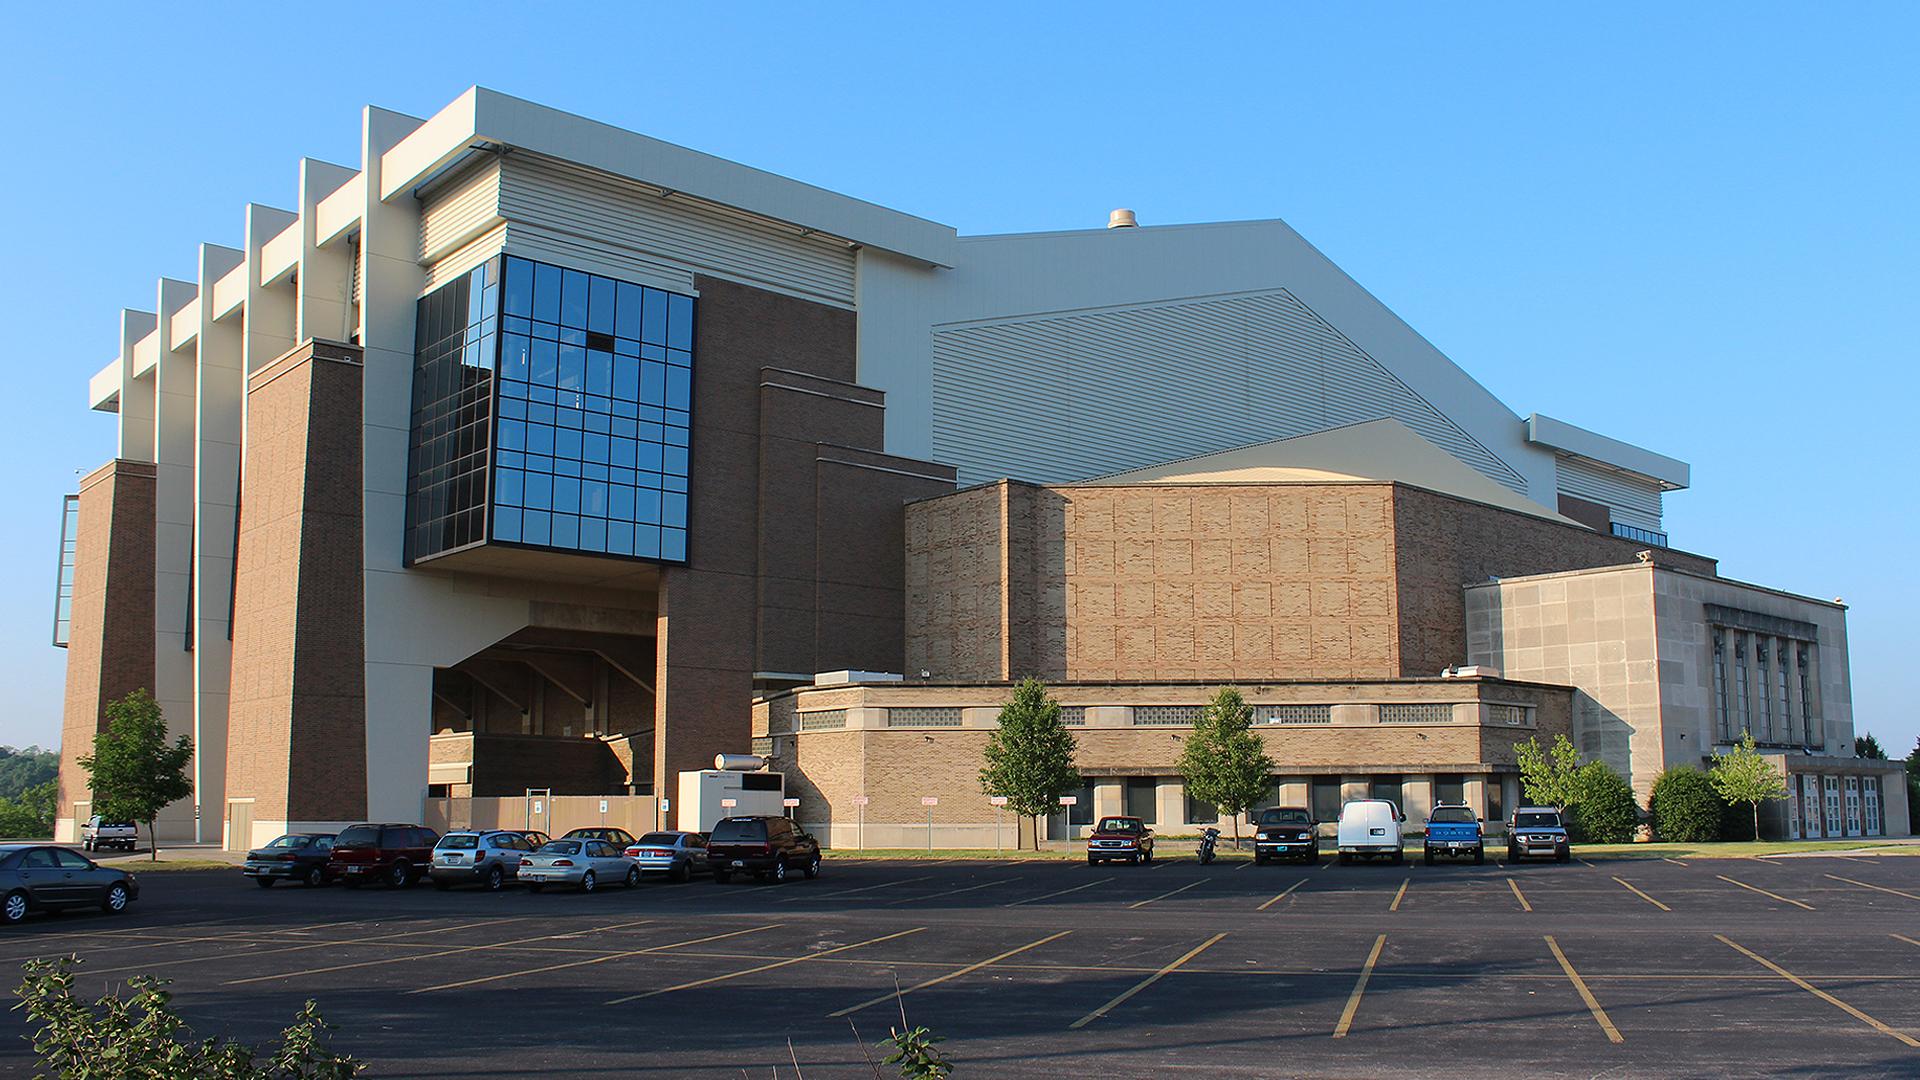 Memorial Coliseum_From North_1542320008736.jpg.jpg